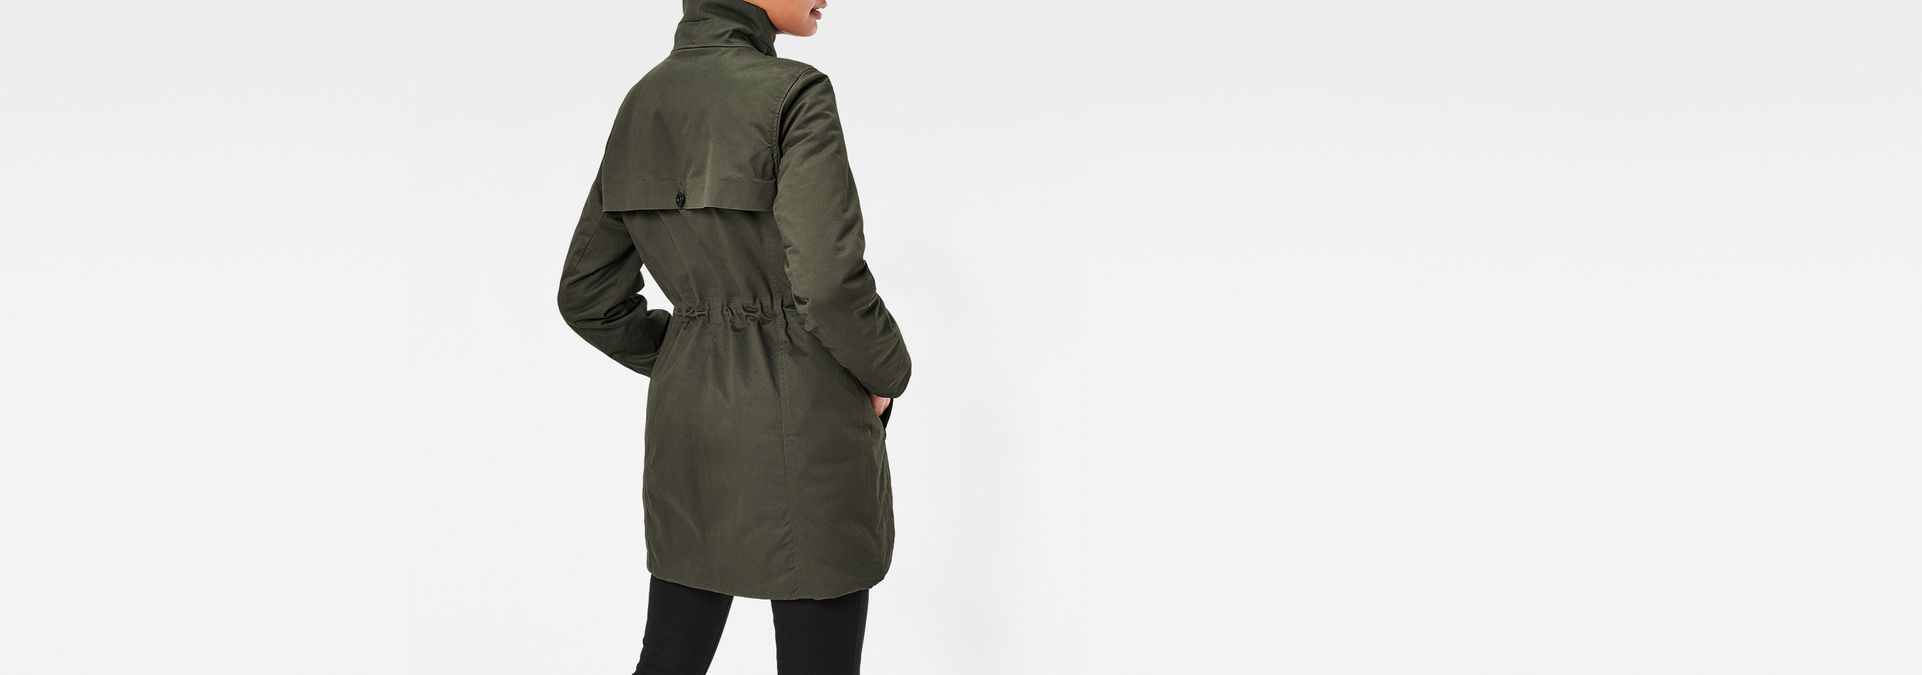 minor classic coat dk combat women g star raw. Black Bedroom Furniture Sets. Home Design Ideas